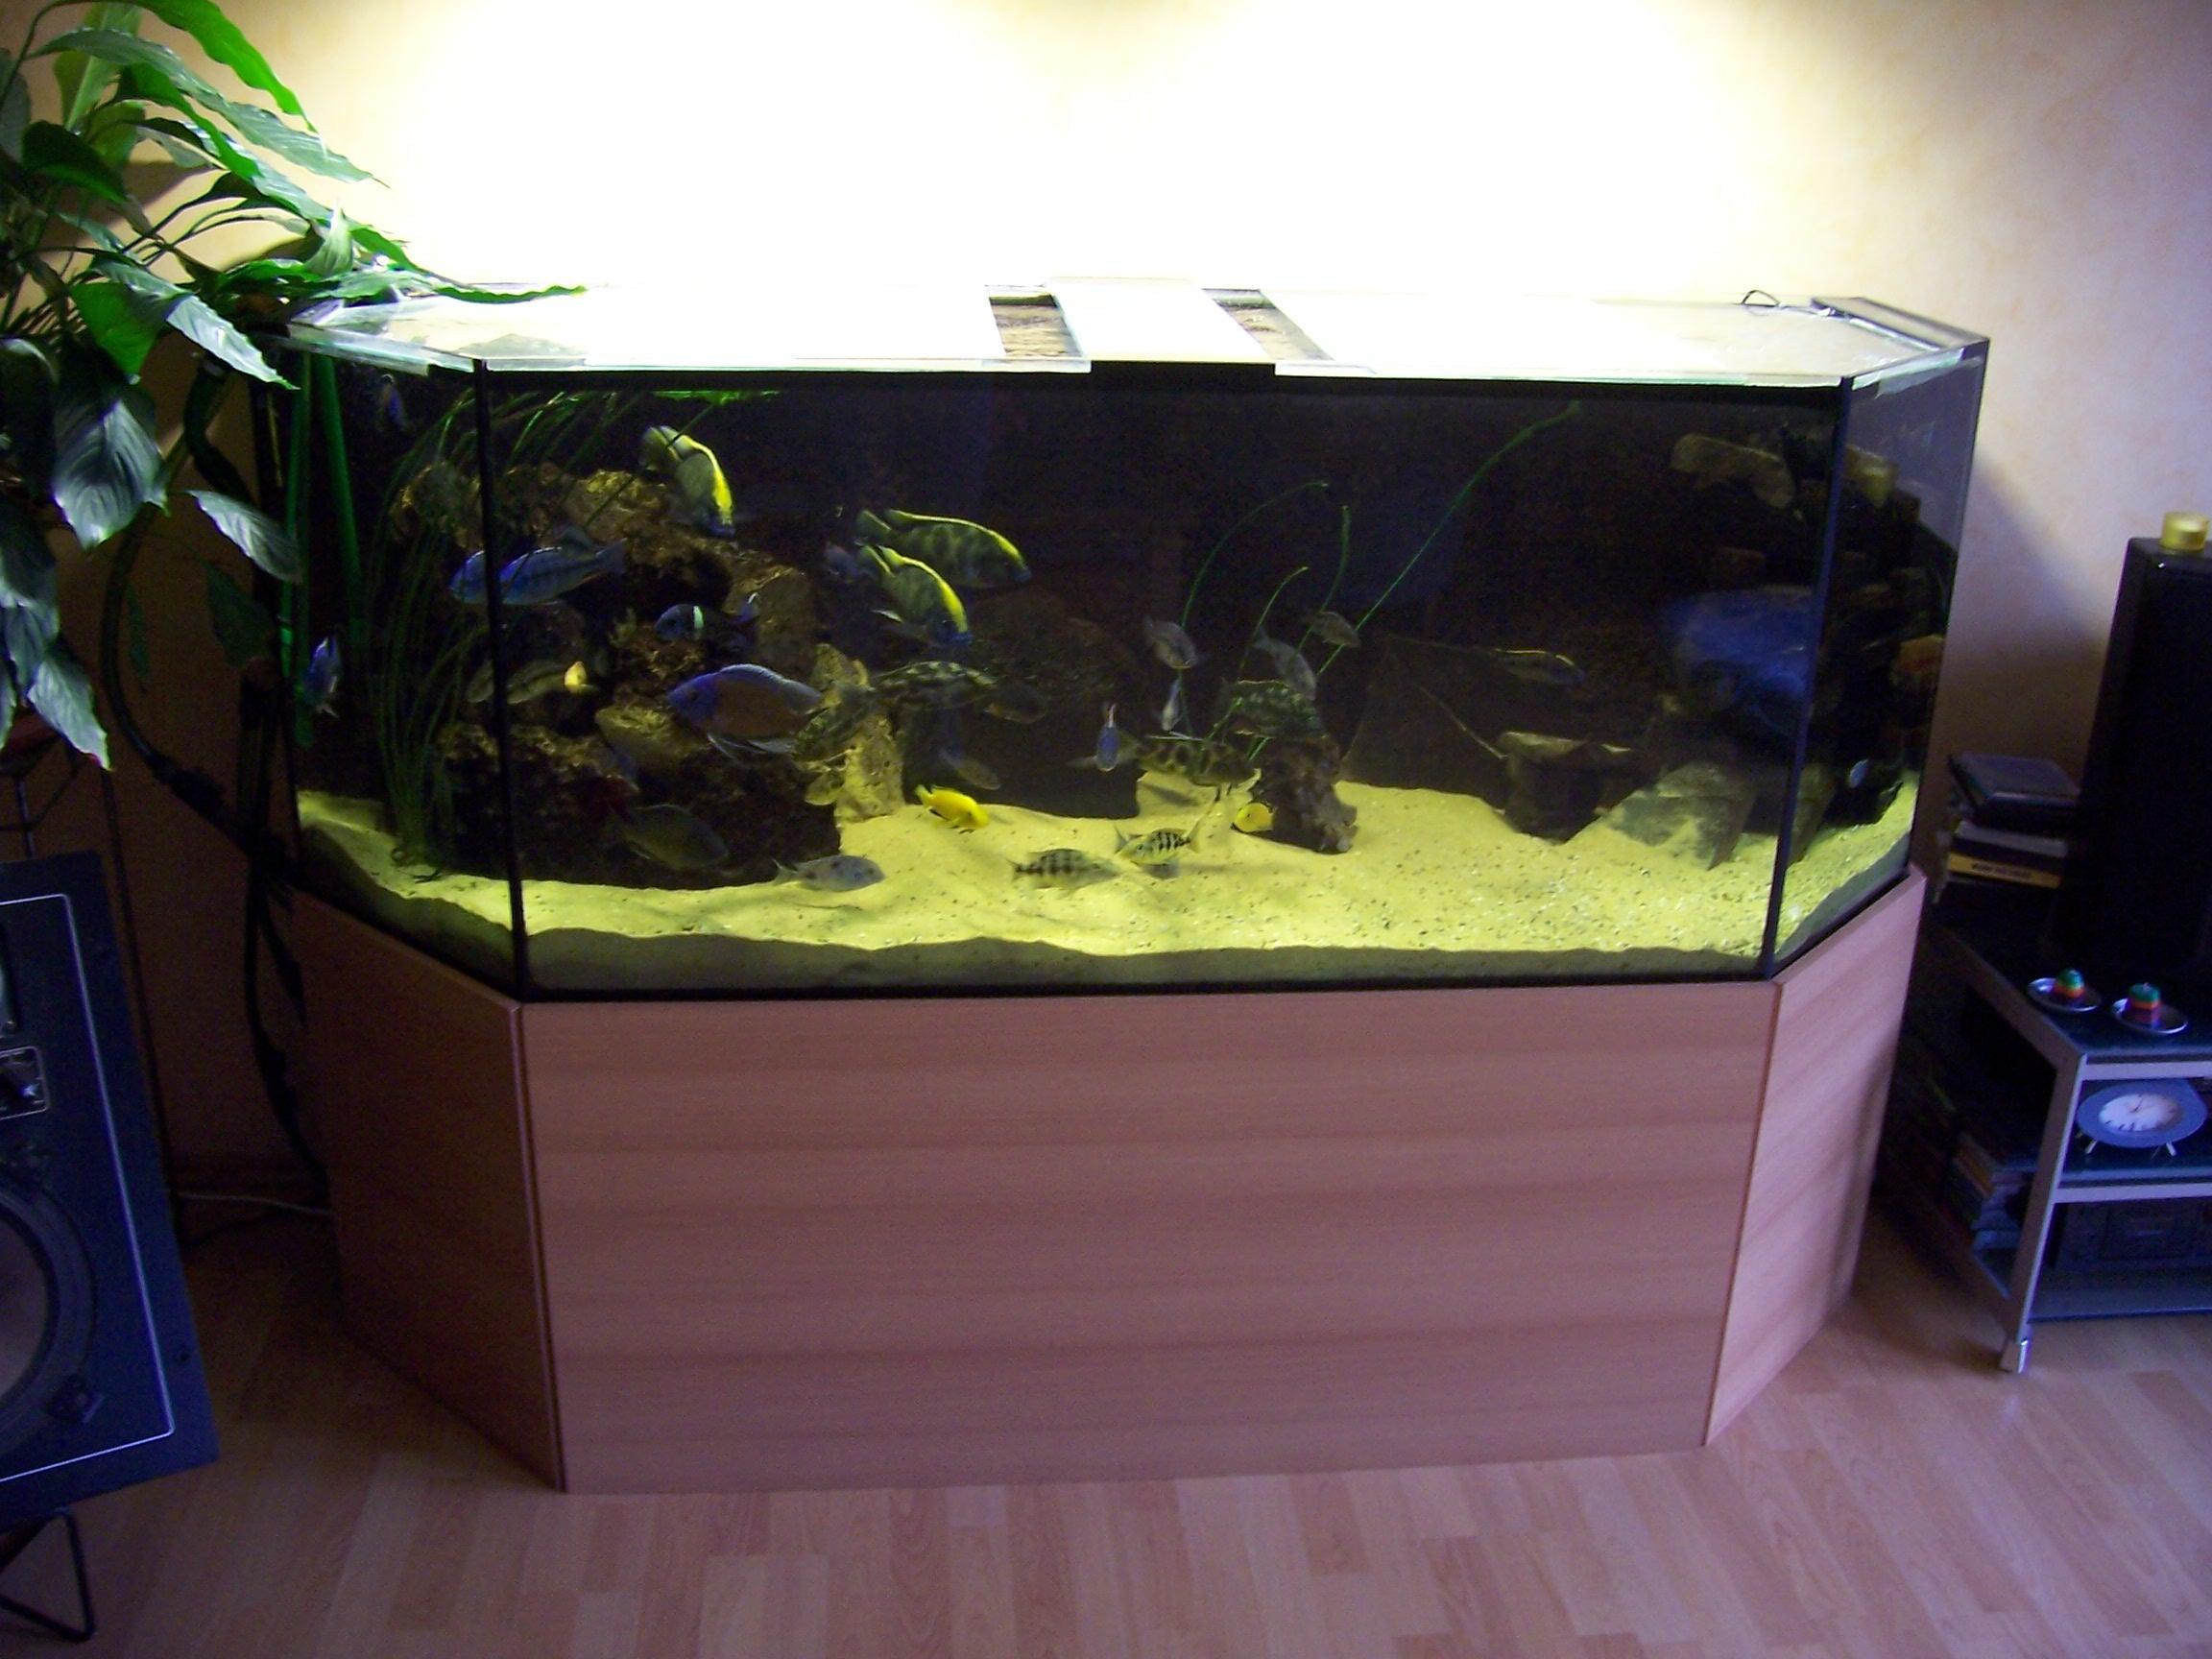 53501 800 liter sechseck aquarium zu verkaufen bieten. Black Bedroom Furniture Sets. Home Design Ideas